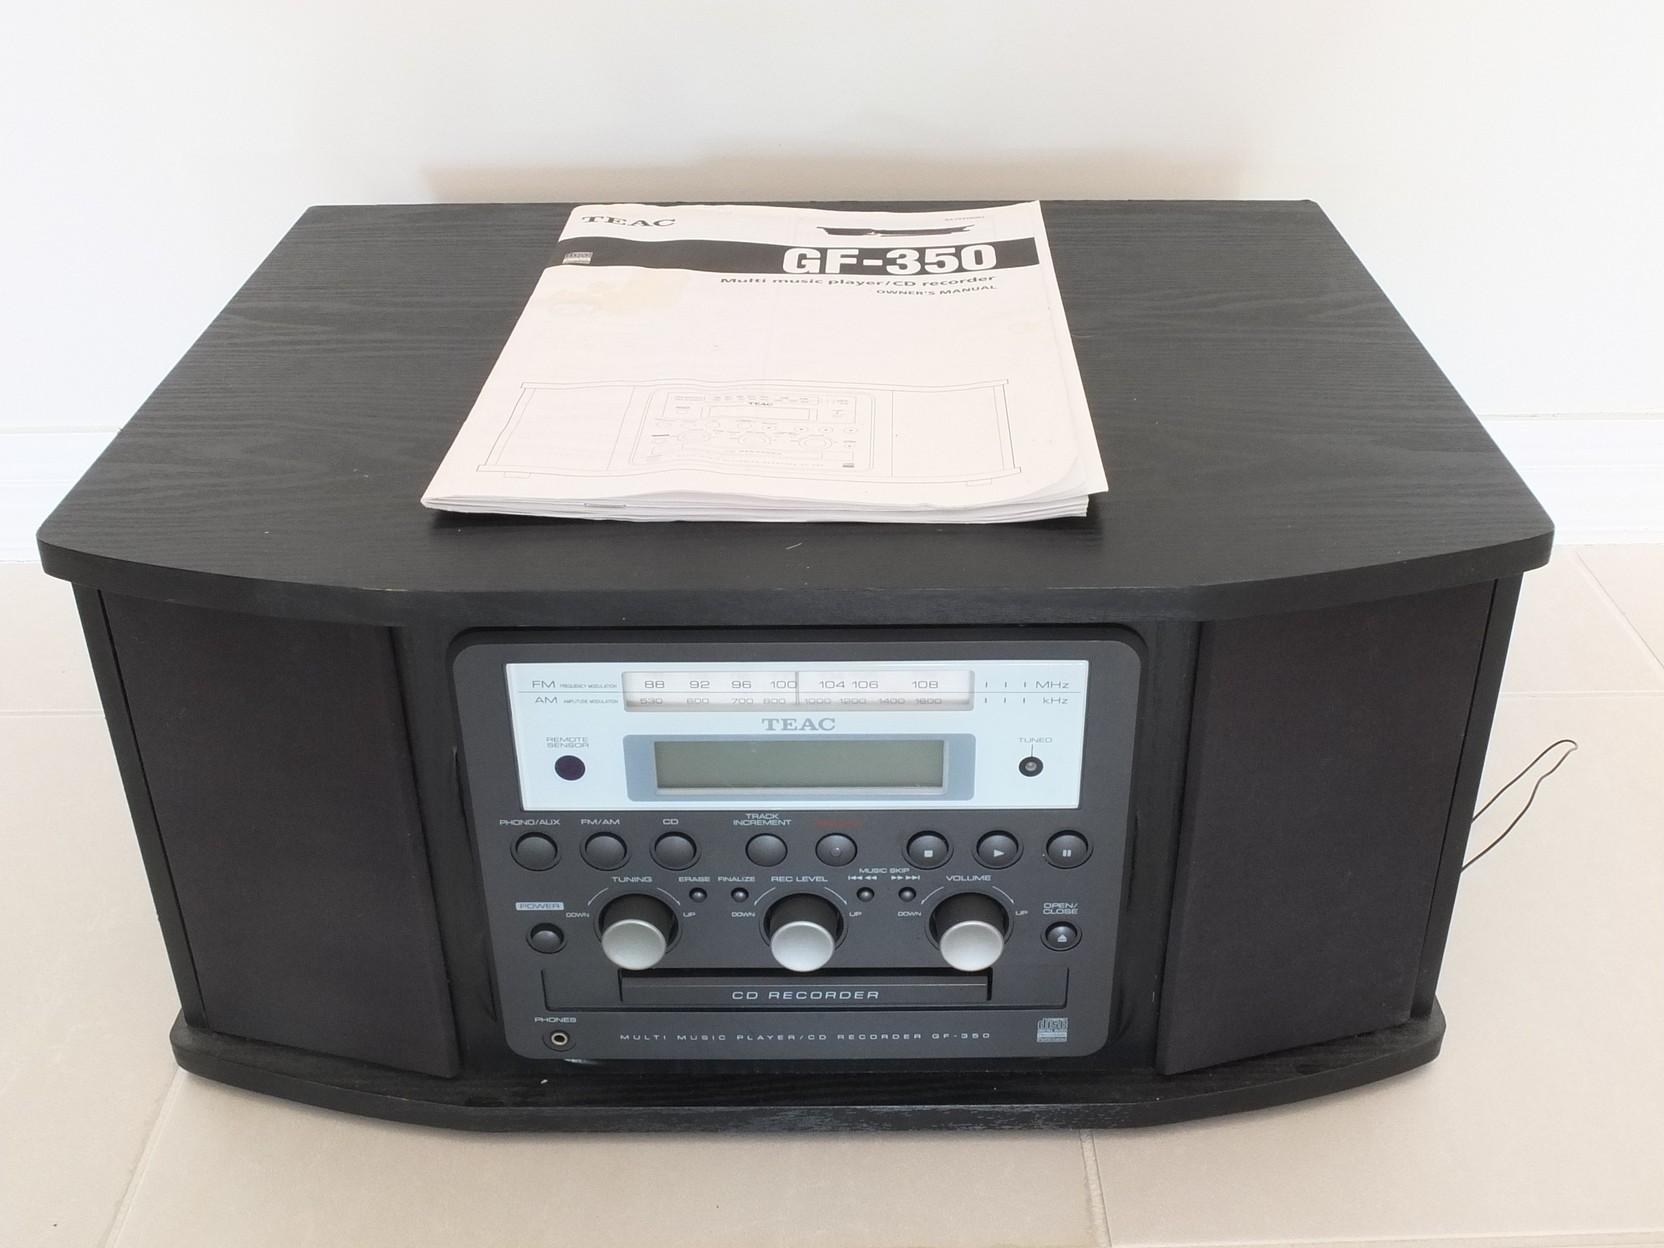 'TEAC GF-350 Multi Music Player / CD Recorder'